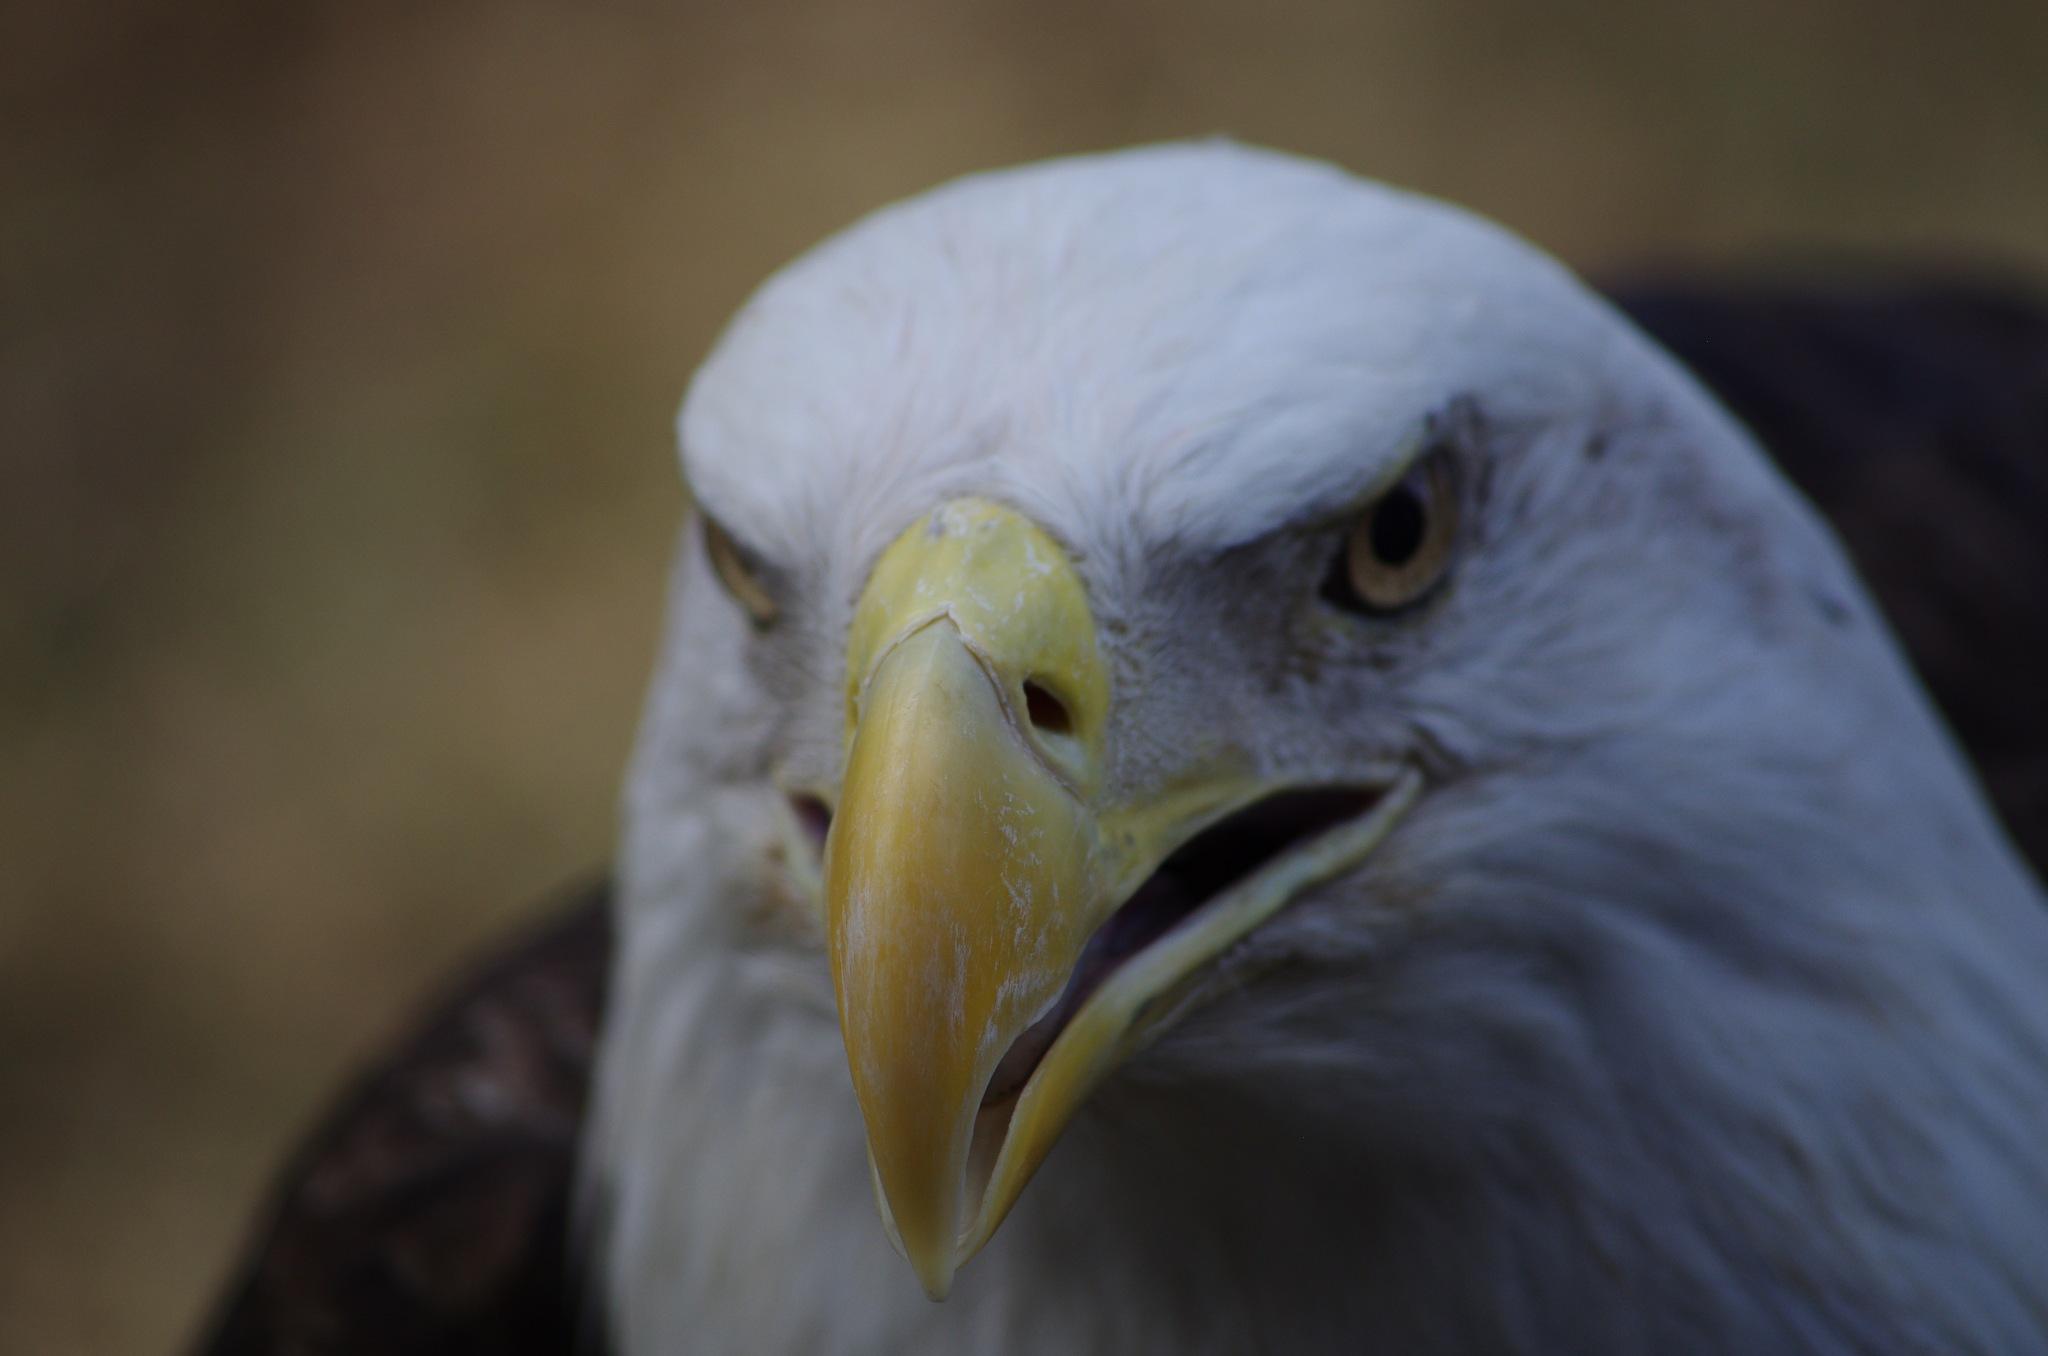 Majestic eagle by denise.bouvier.3